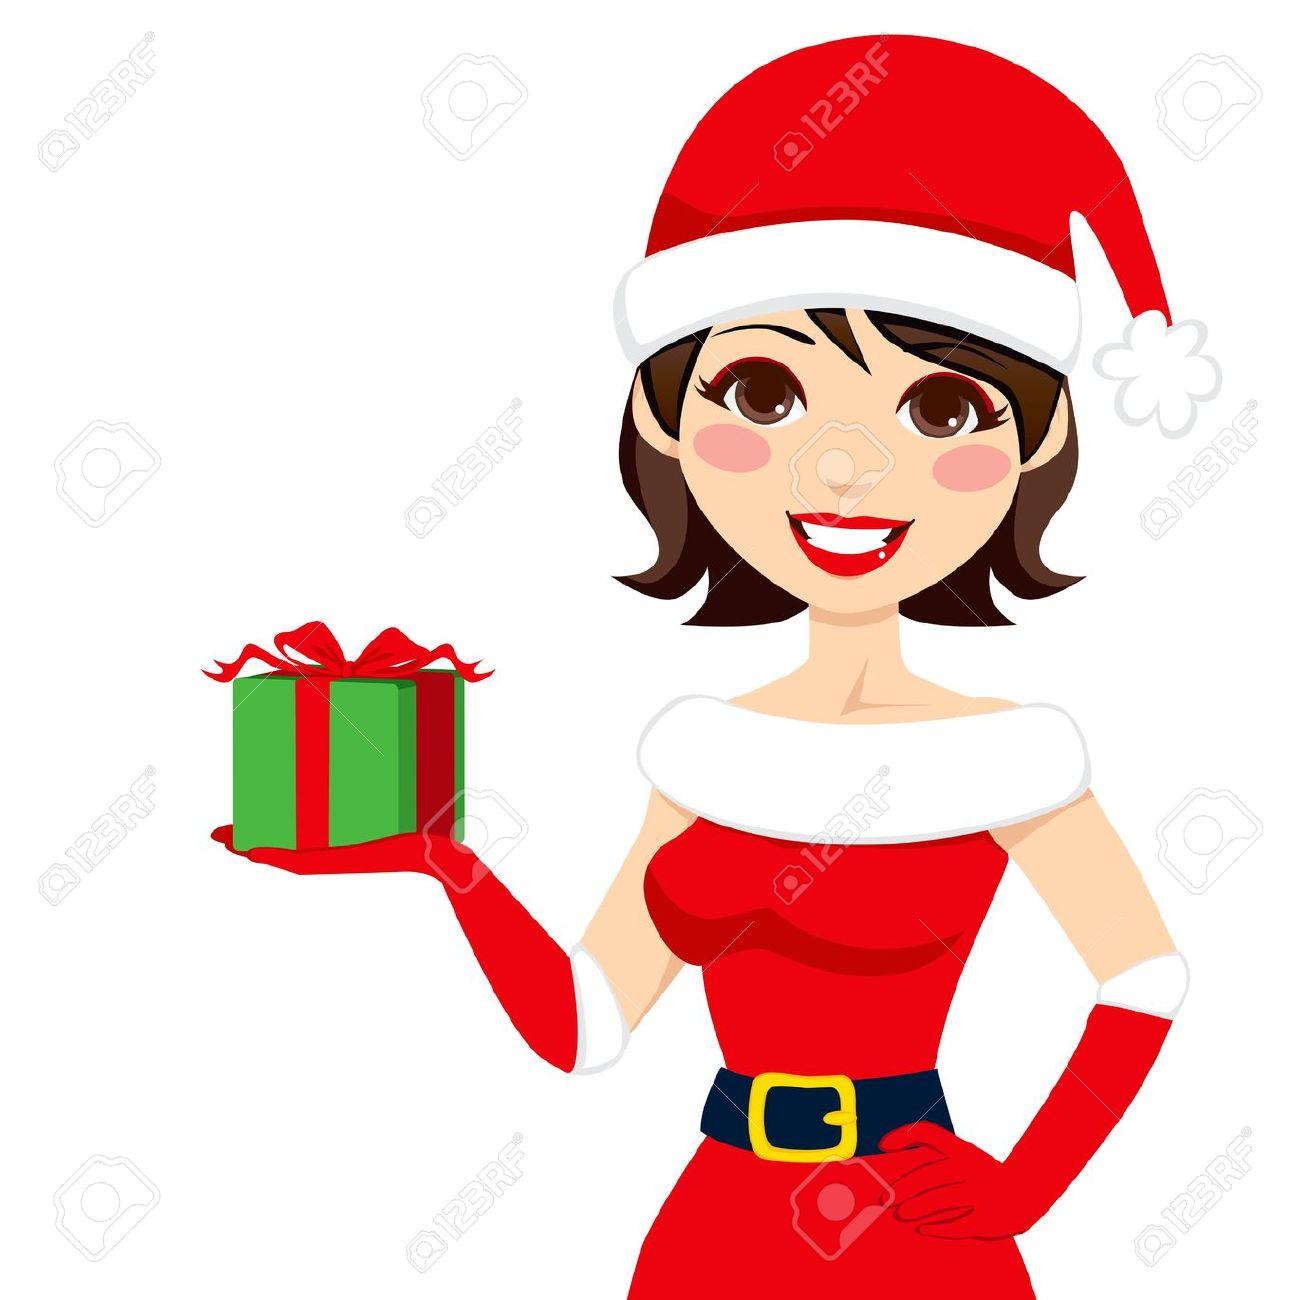 hight resolution of 1300x1300 santa clipart suggestions for santa clipart download santa clipart